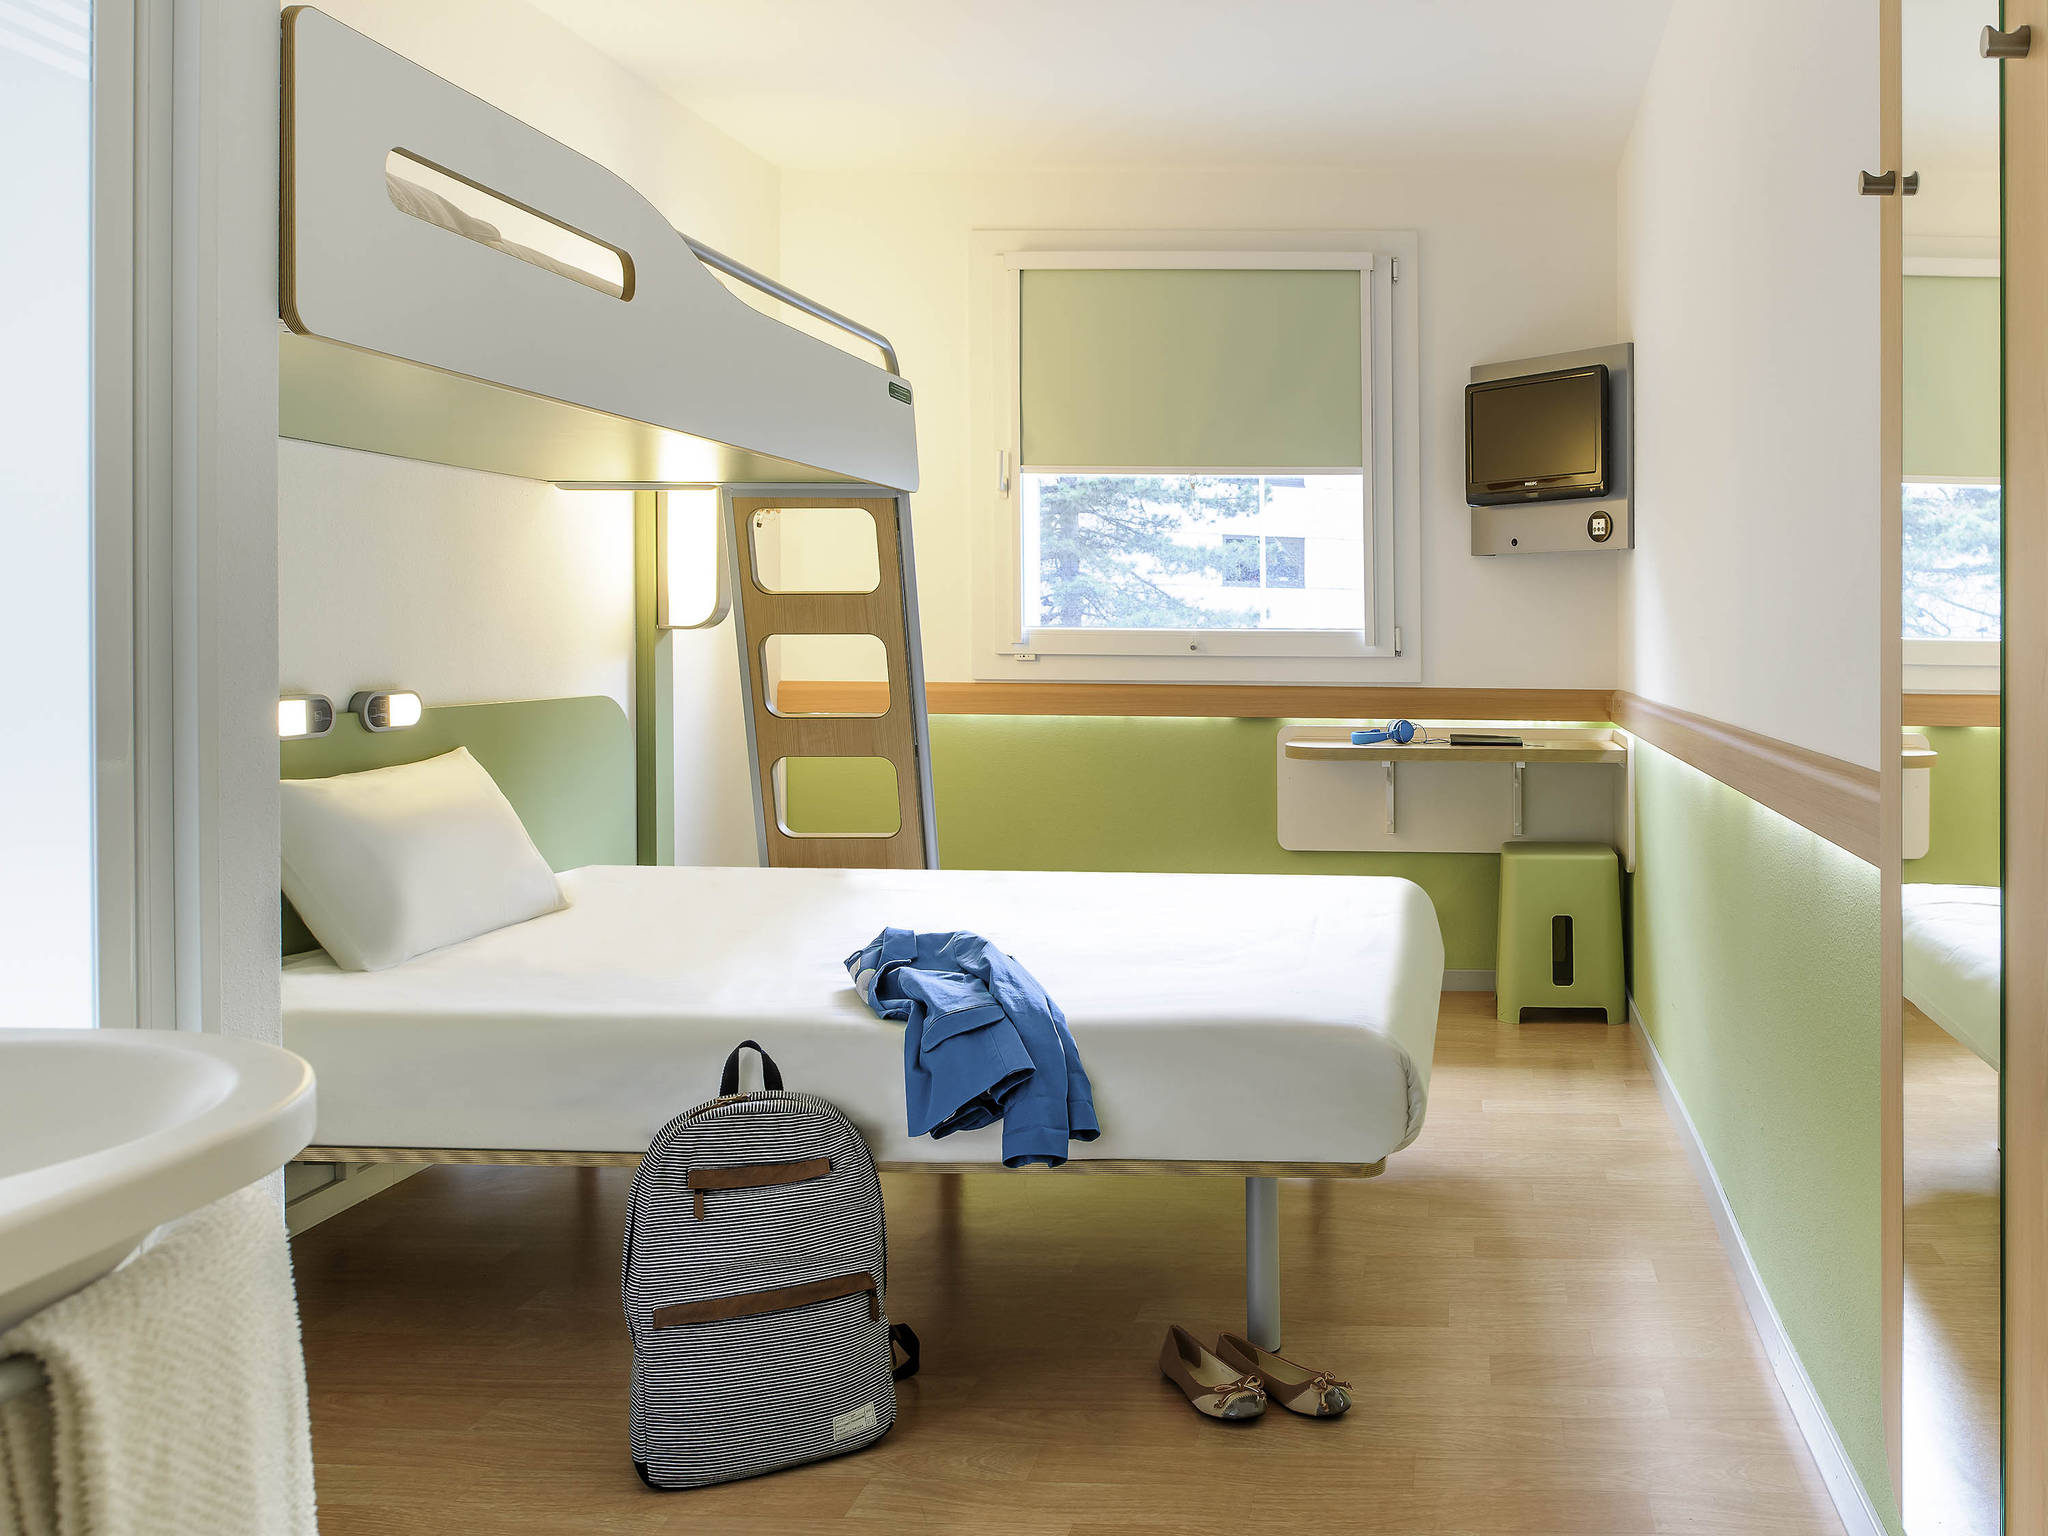 Hotel en istres ibis budget istres trigance for Hotel f1 salon de provence